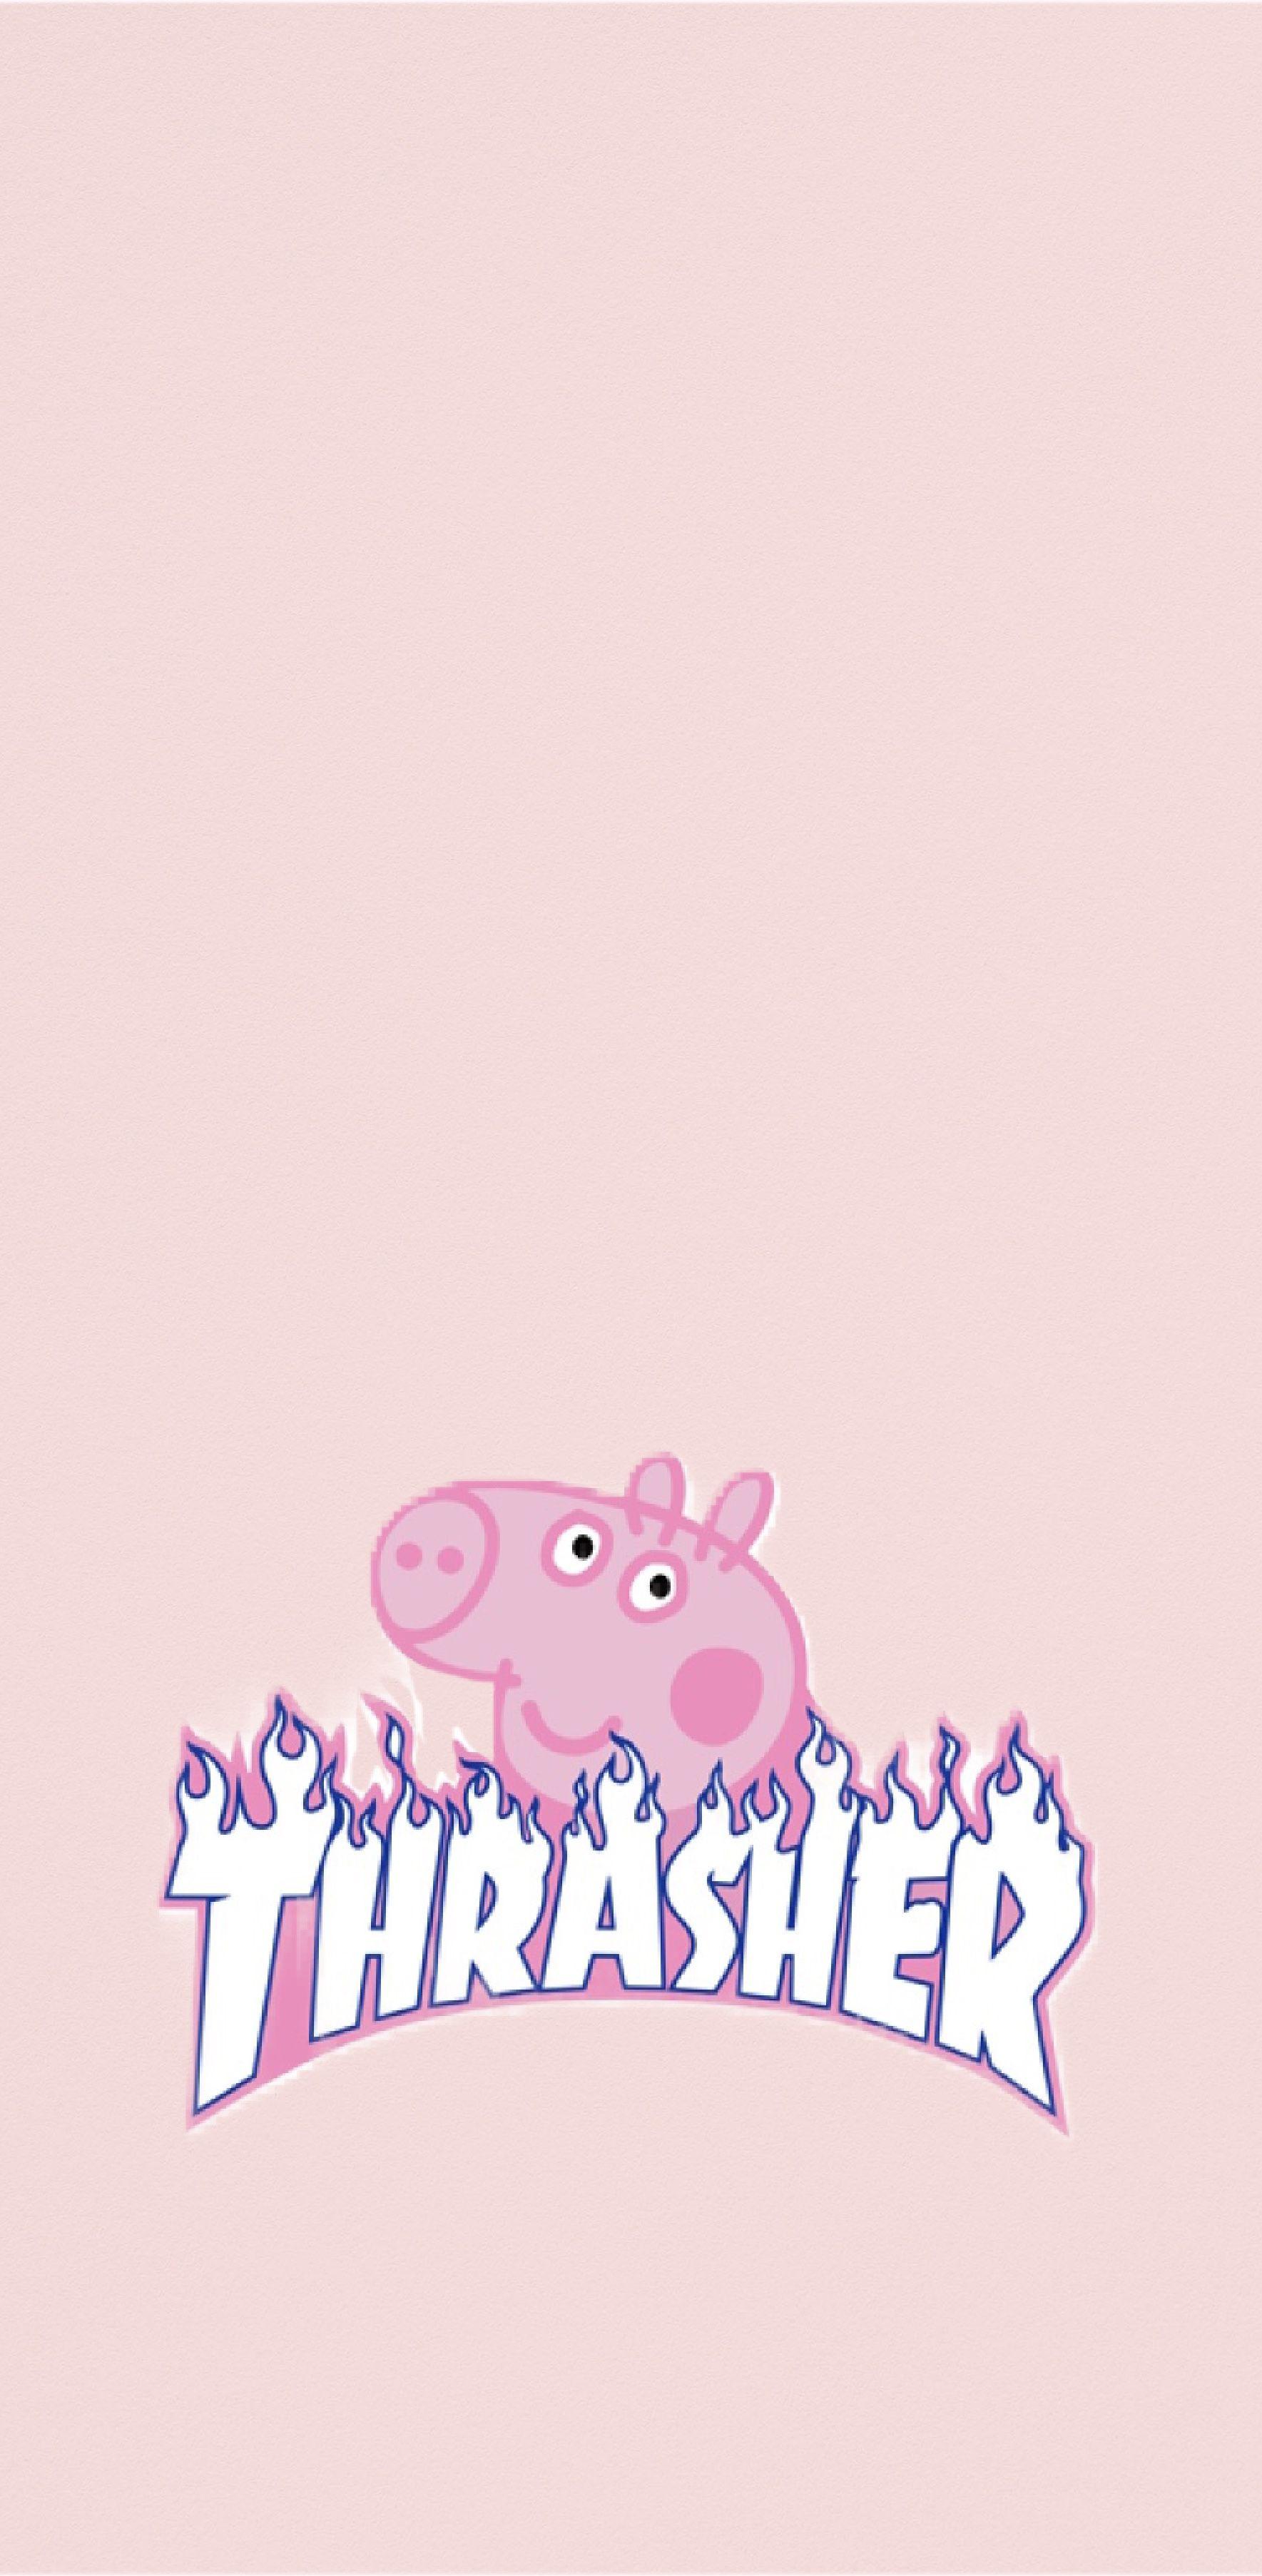 Pin By Amelia Vanwyck On My Posts Peppa Pig Wallpaper Pig